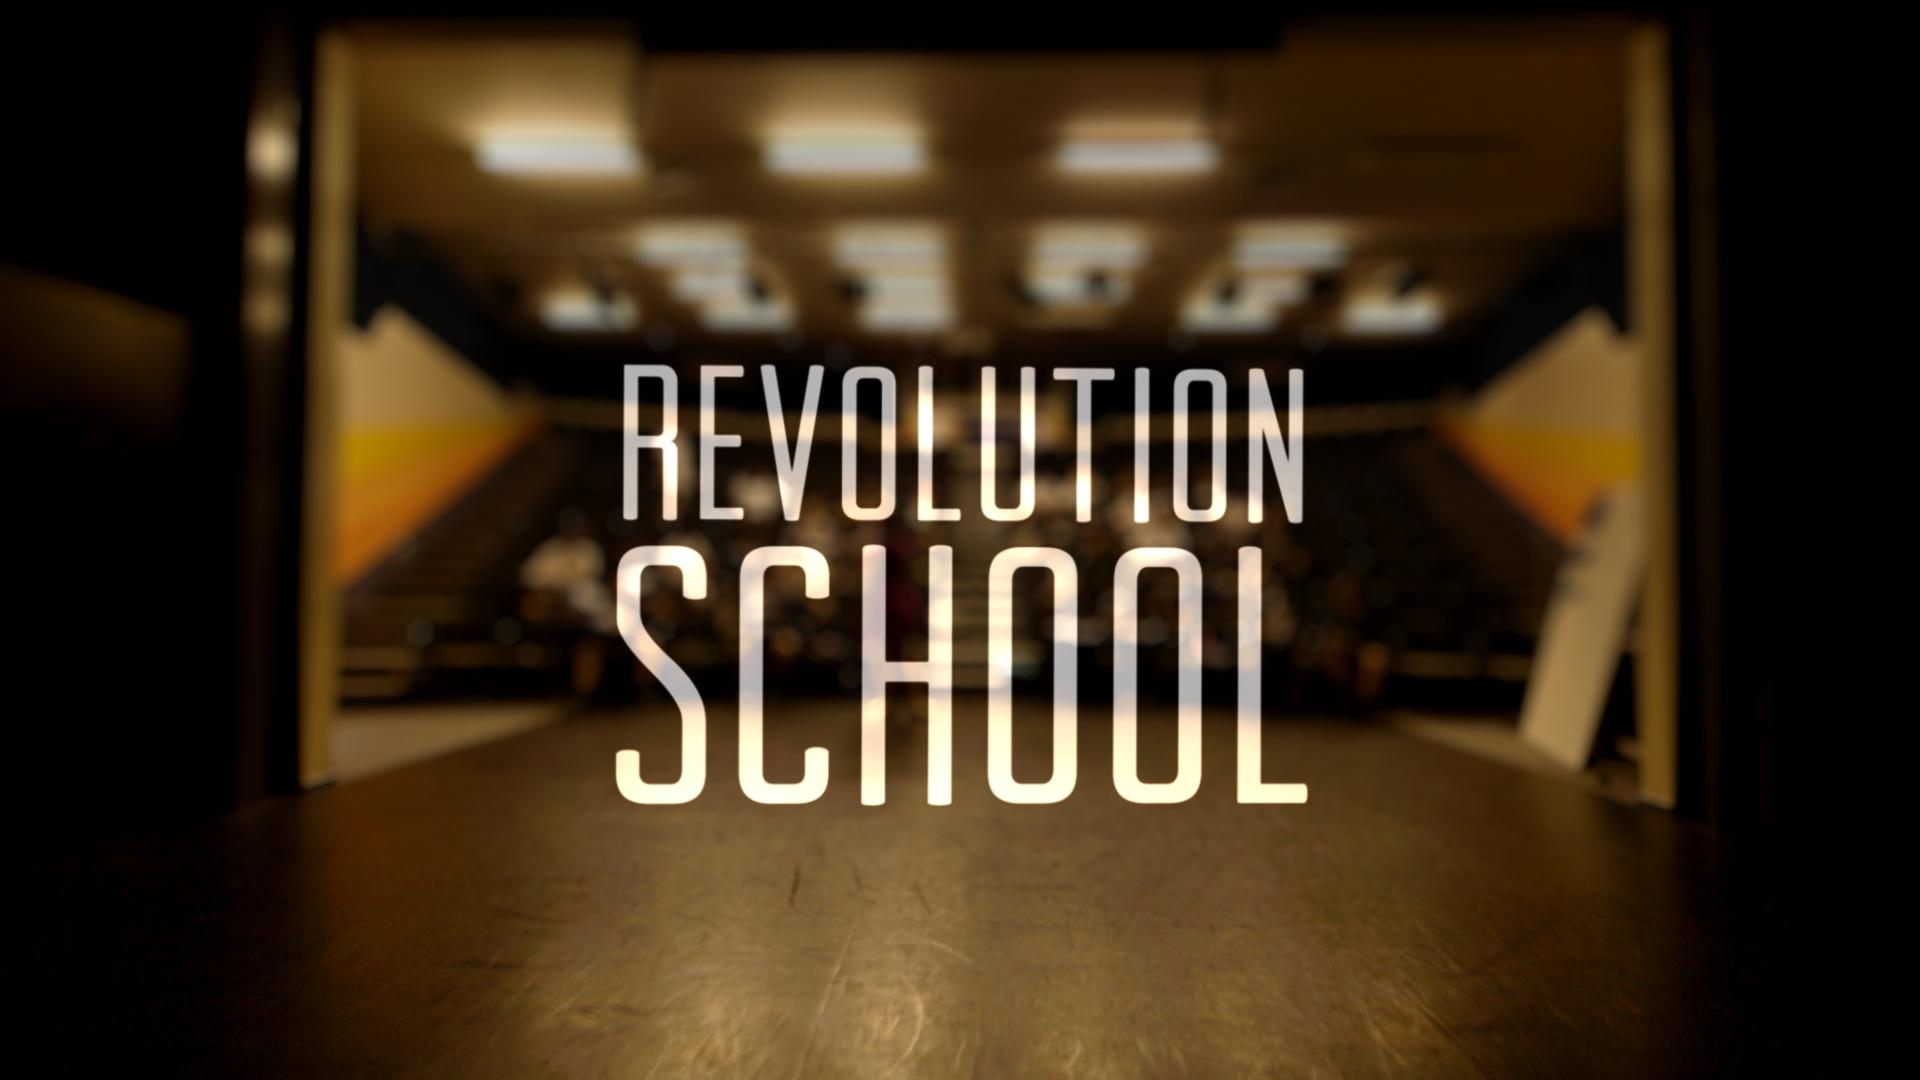 REVOLUTION SCHOOL - DOCUMENTARY SERIES